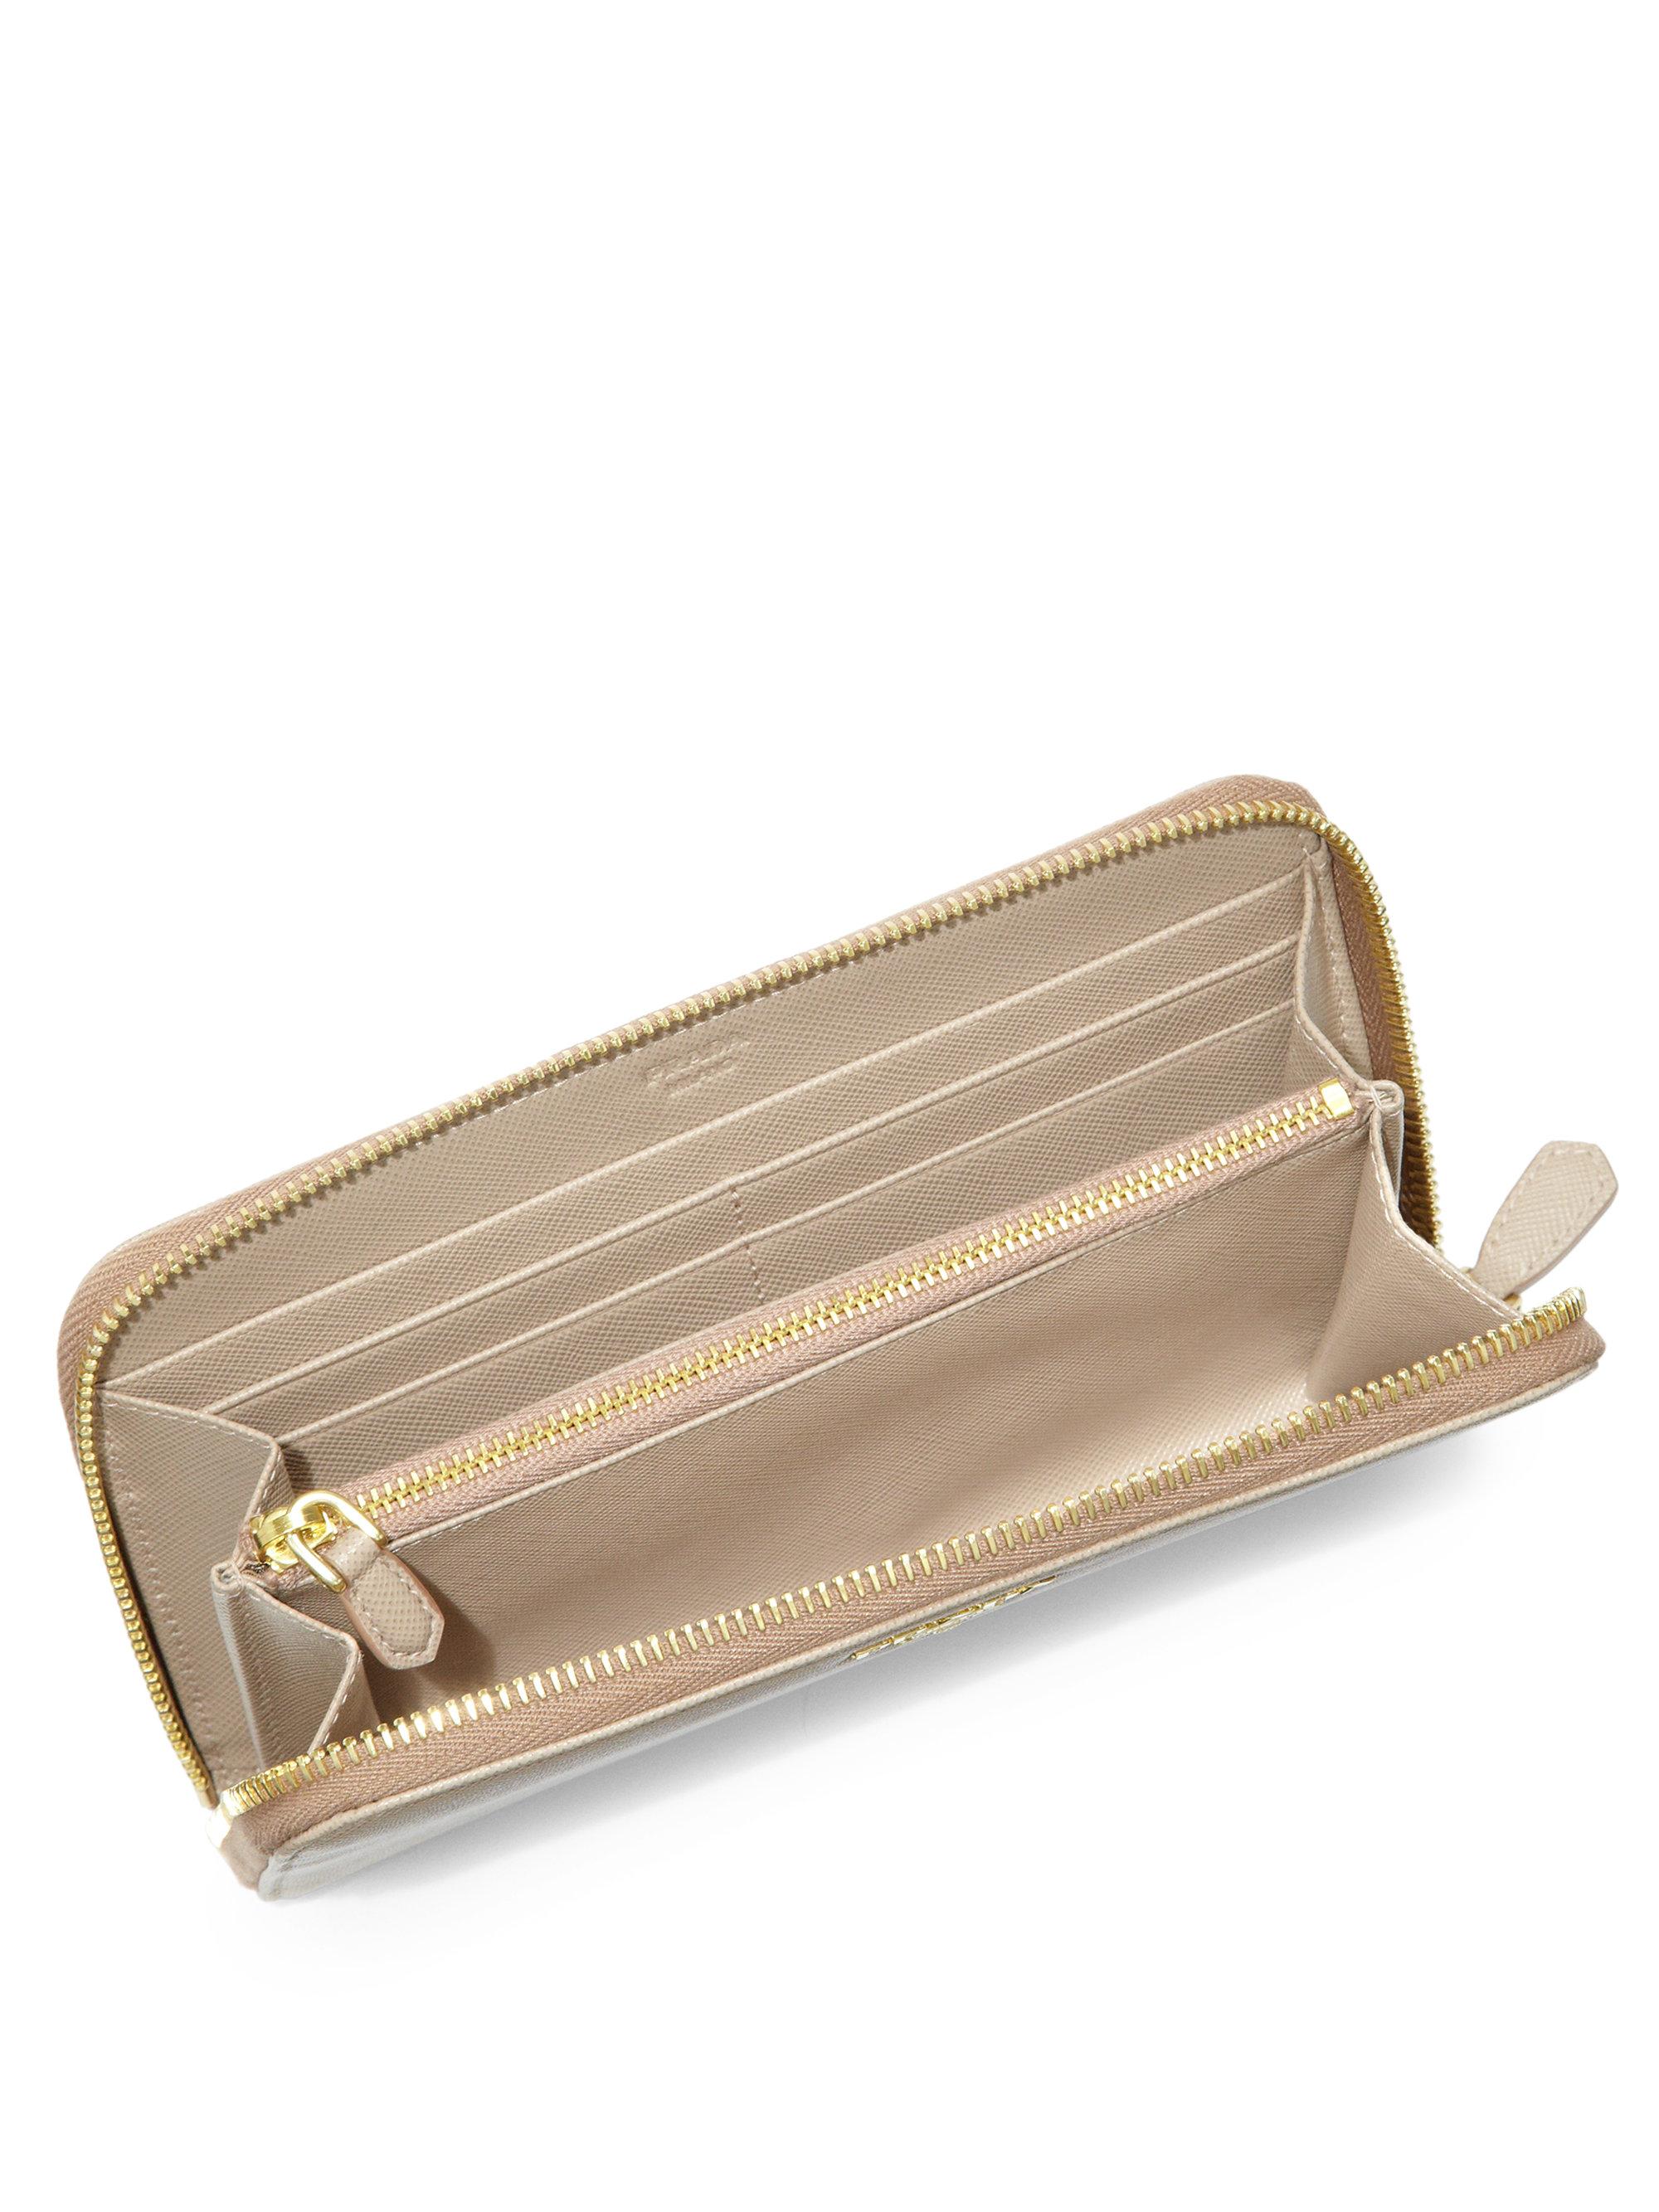 prada saffiano continental wallet large - prada saffiano bow continental wallet